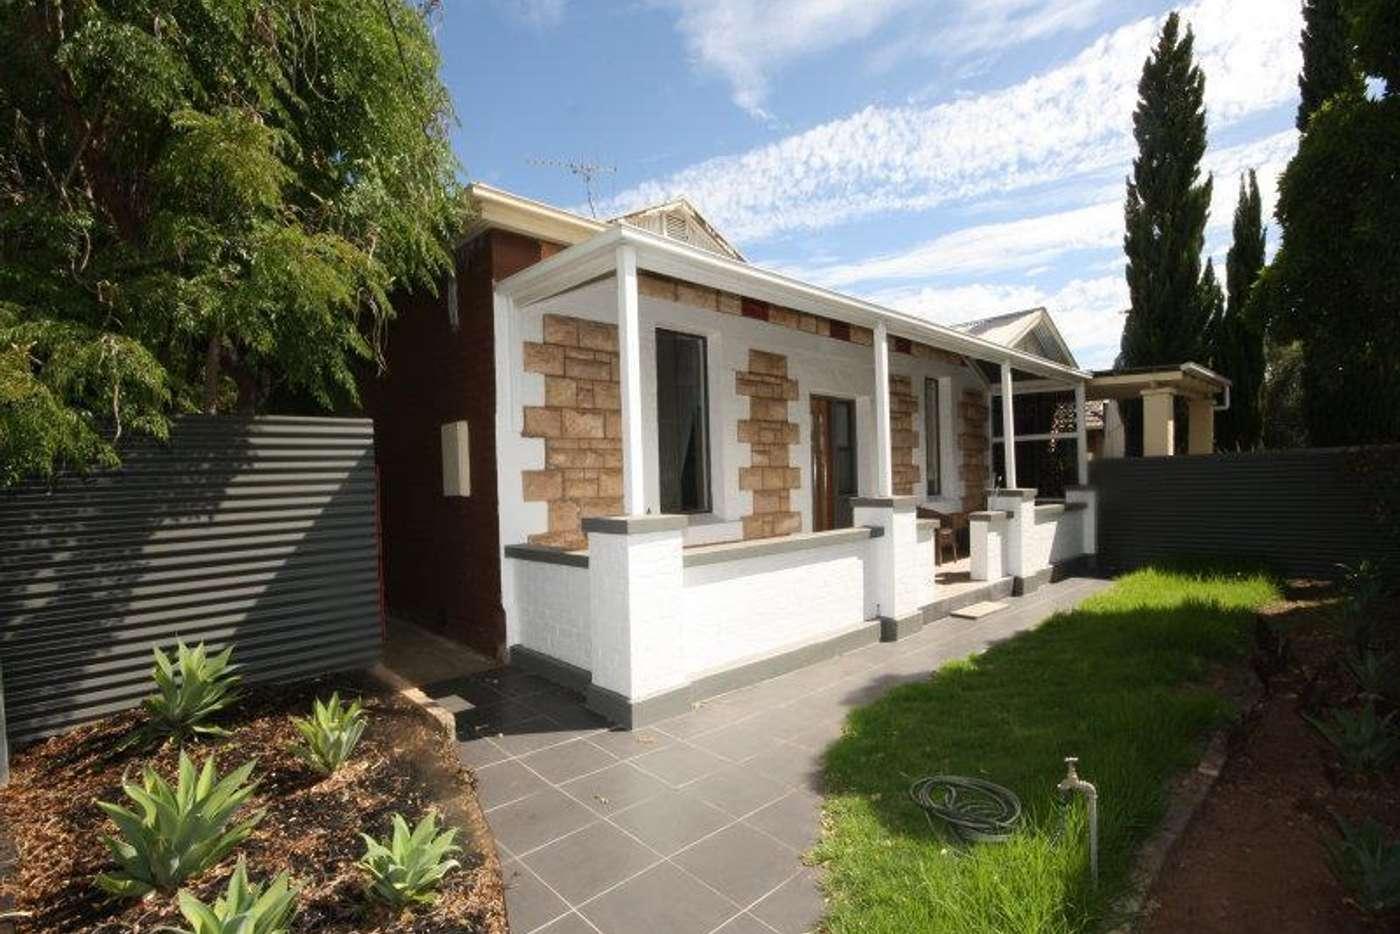 Main view of Homely house listing, 1 Wattle Street, Fullarton SA 5063